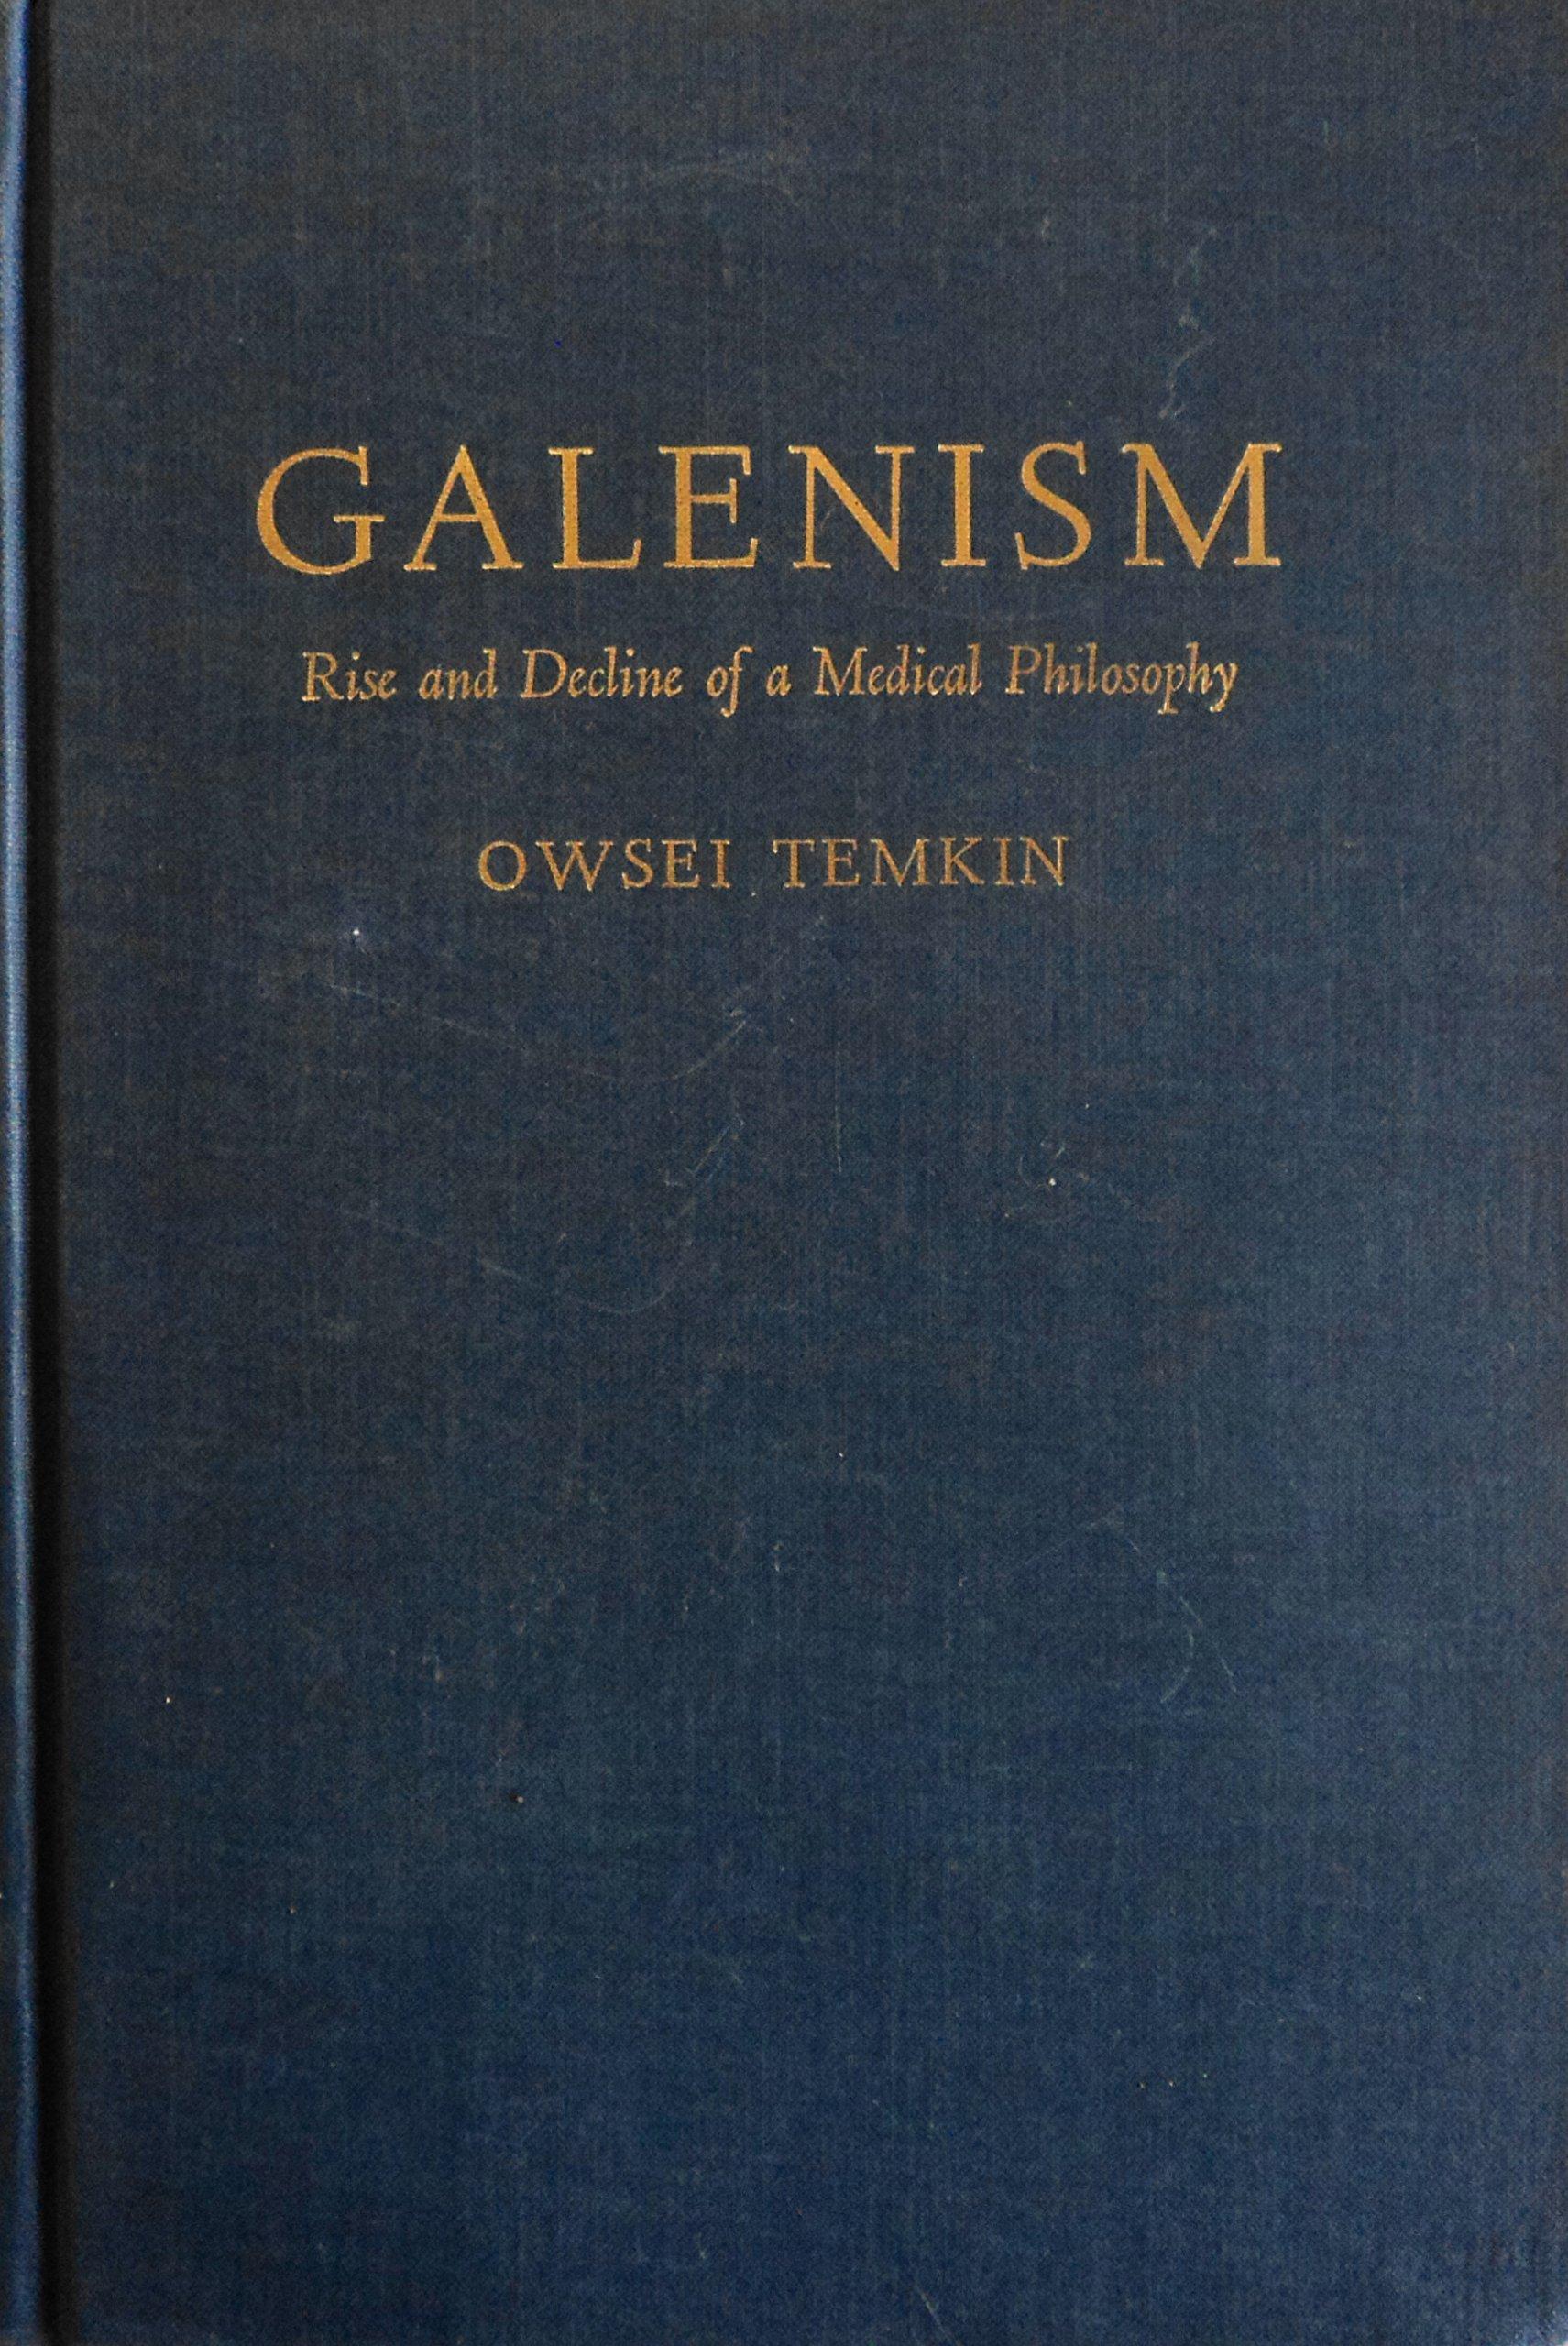 Galenism: Rise and Decline of a Medical Philosophy: Amazon.es: Owsei  Temkin: Libros en idiomas extranjeros